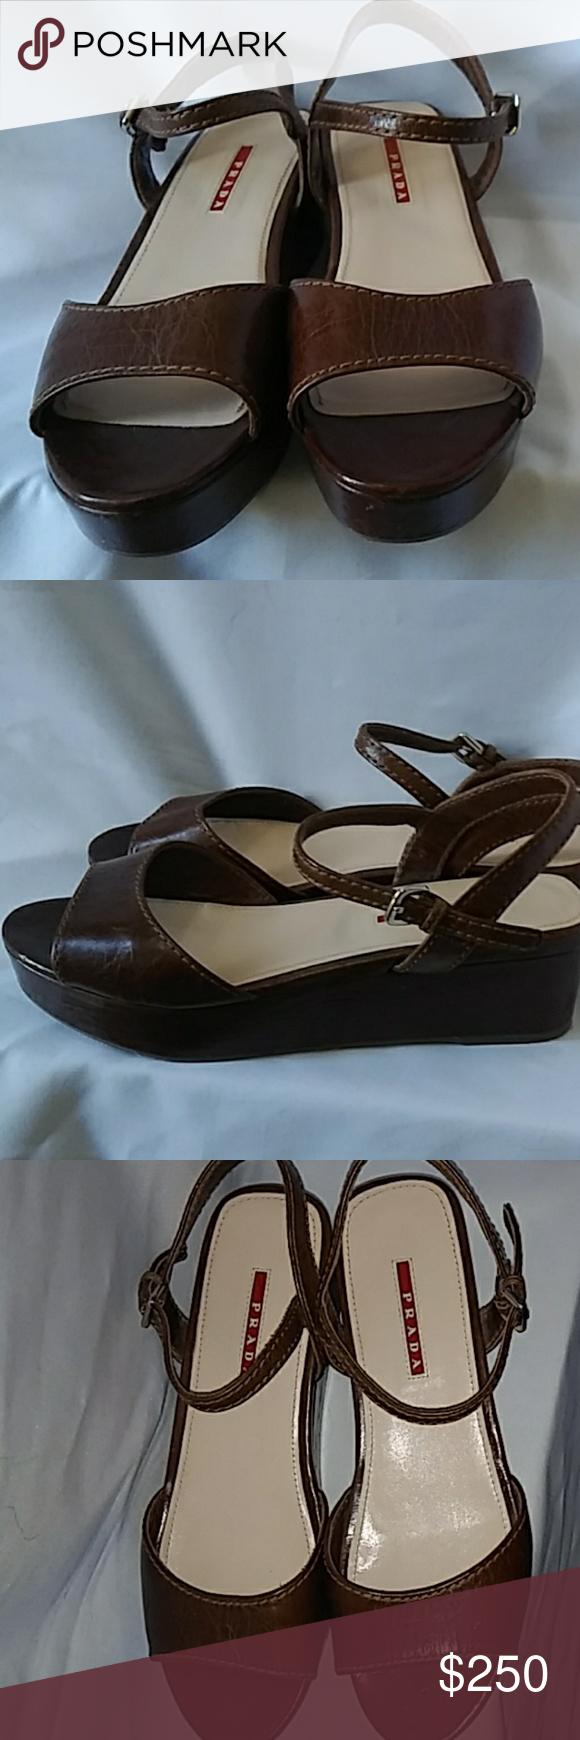 Prada brown wedge sandal Never worn. Size 39 1/2. Brown crinkle leather. Sandal with low wedge. Prada Shoes Wedges #lowwedgesandals